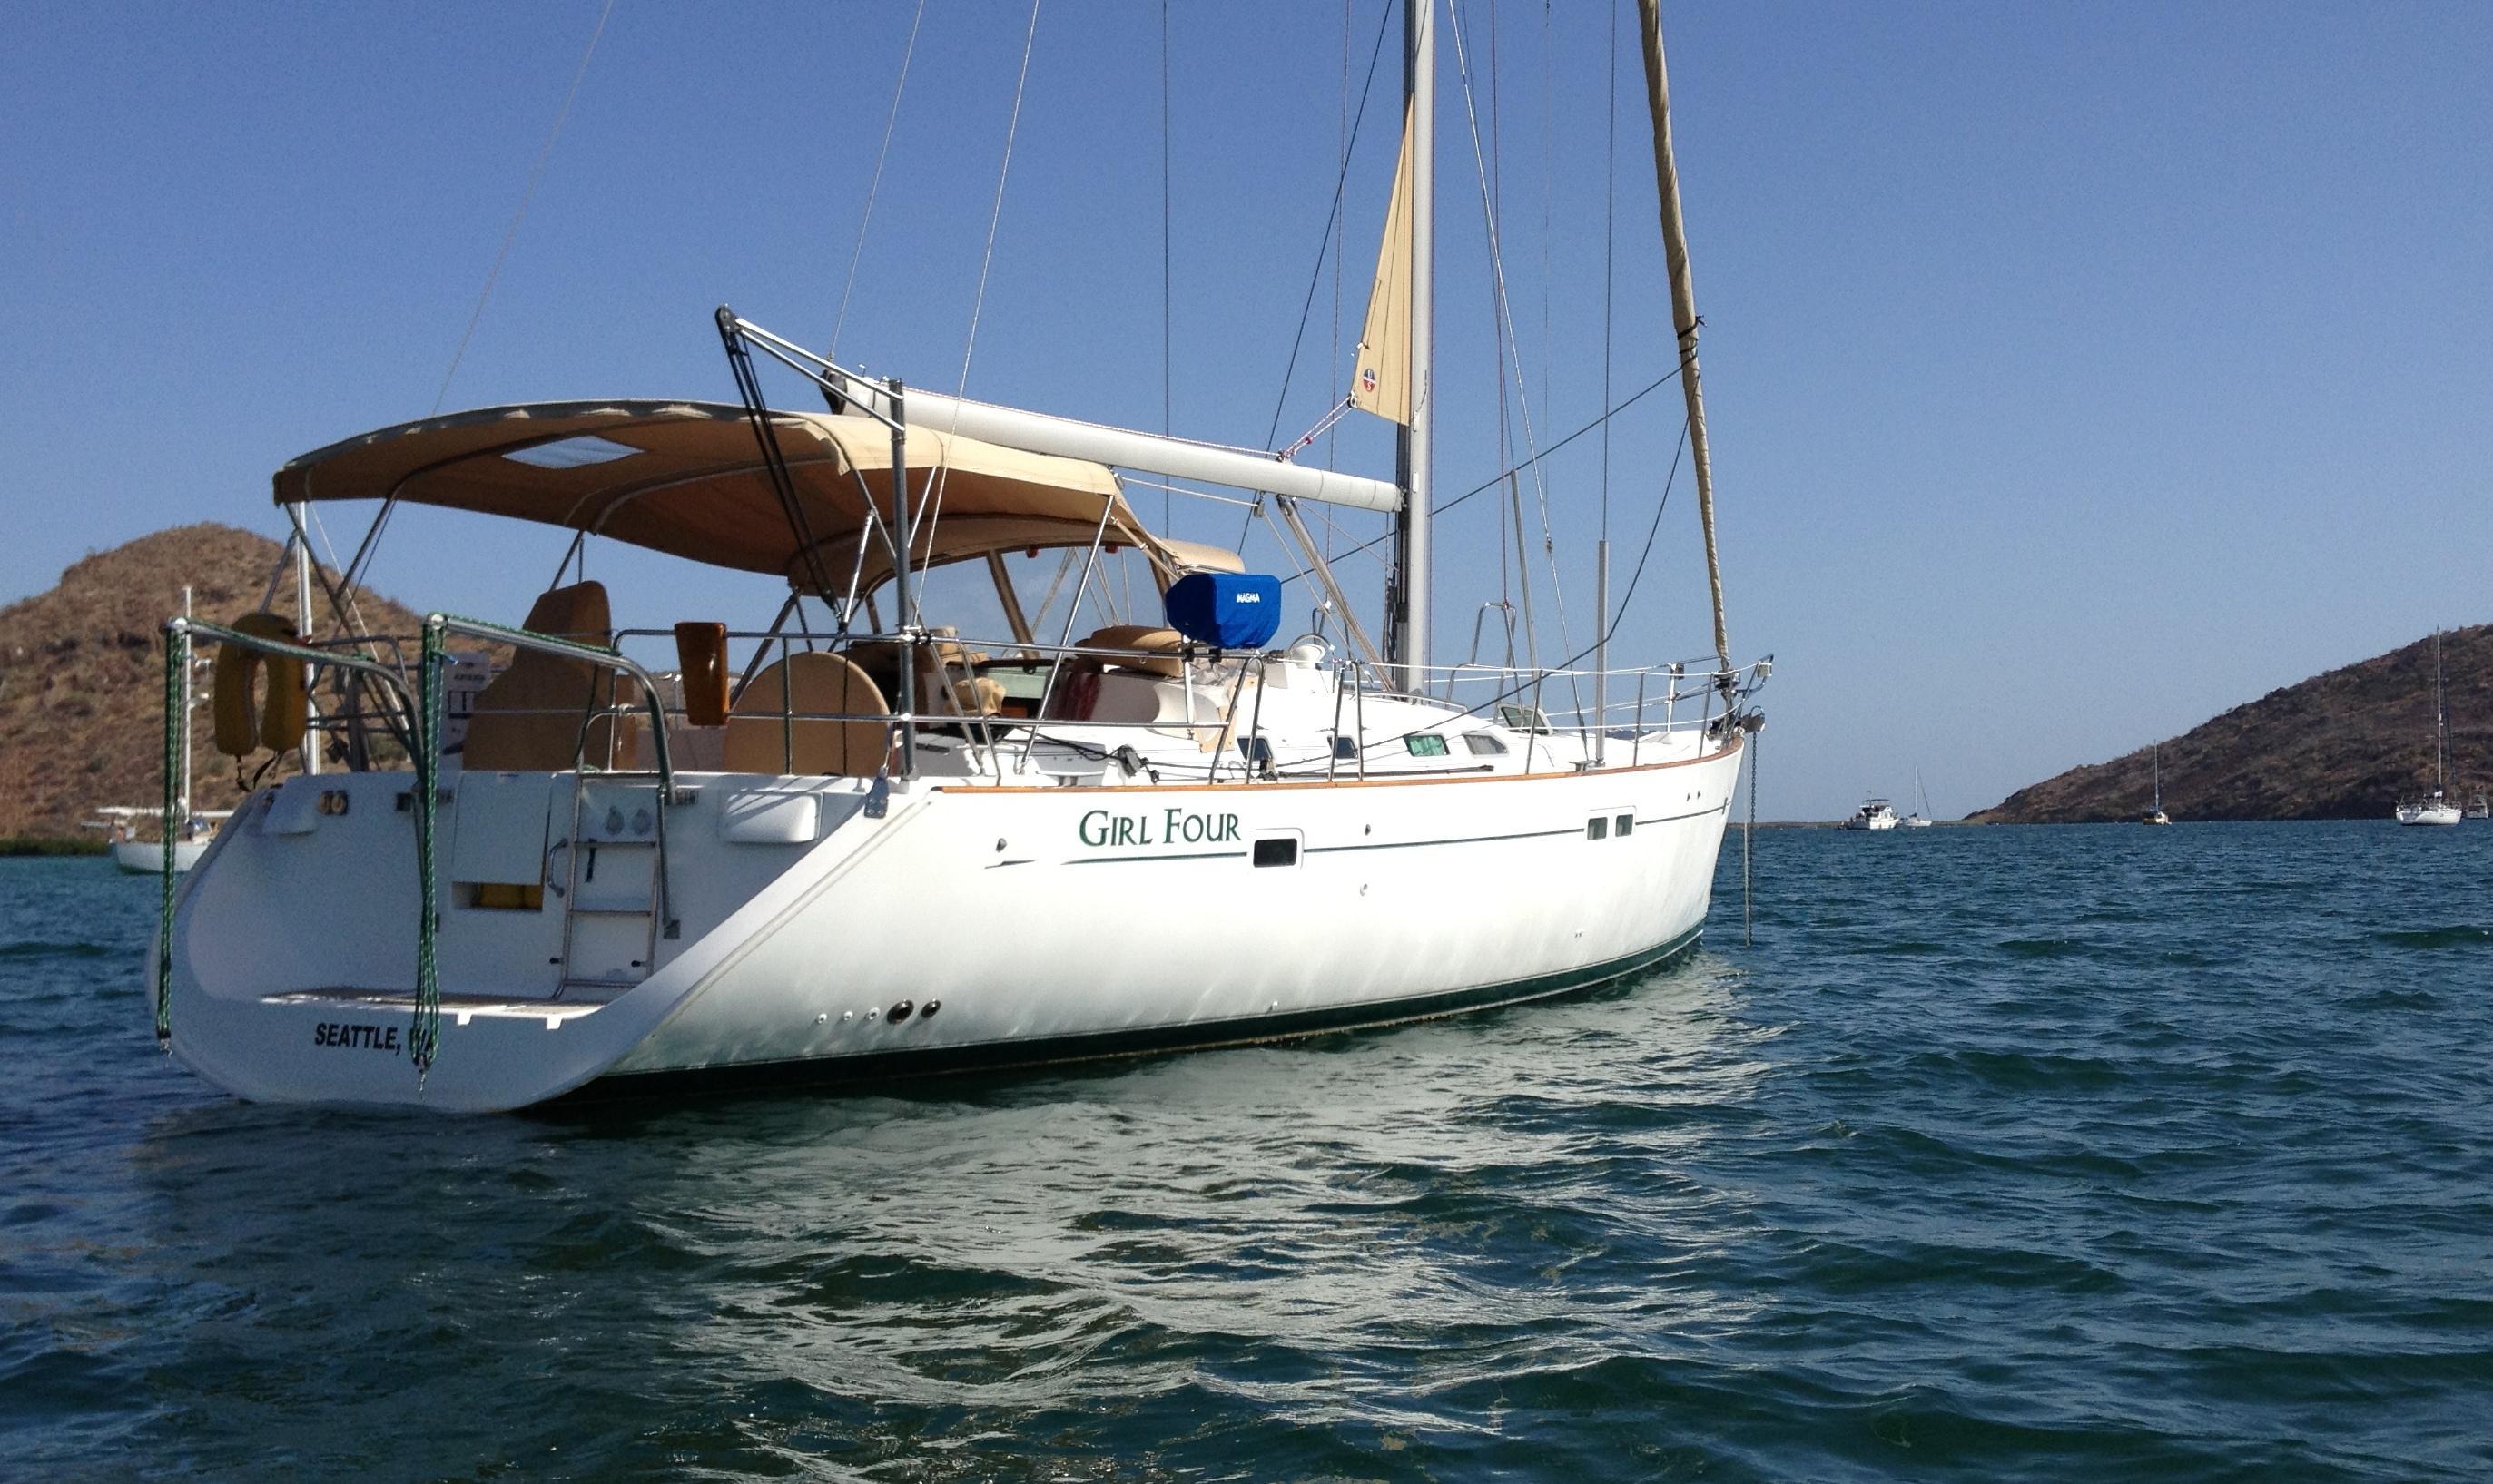 2002 Beneteau Oceanis 473 Sail Boat For Sale - www.yachtworld.com